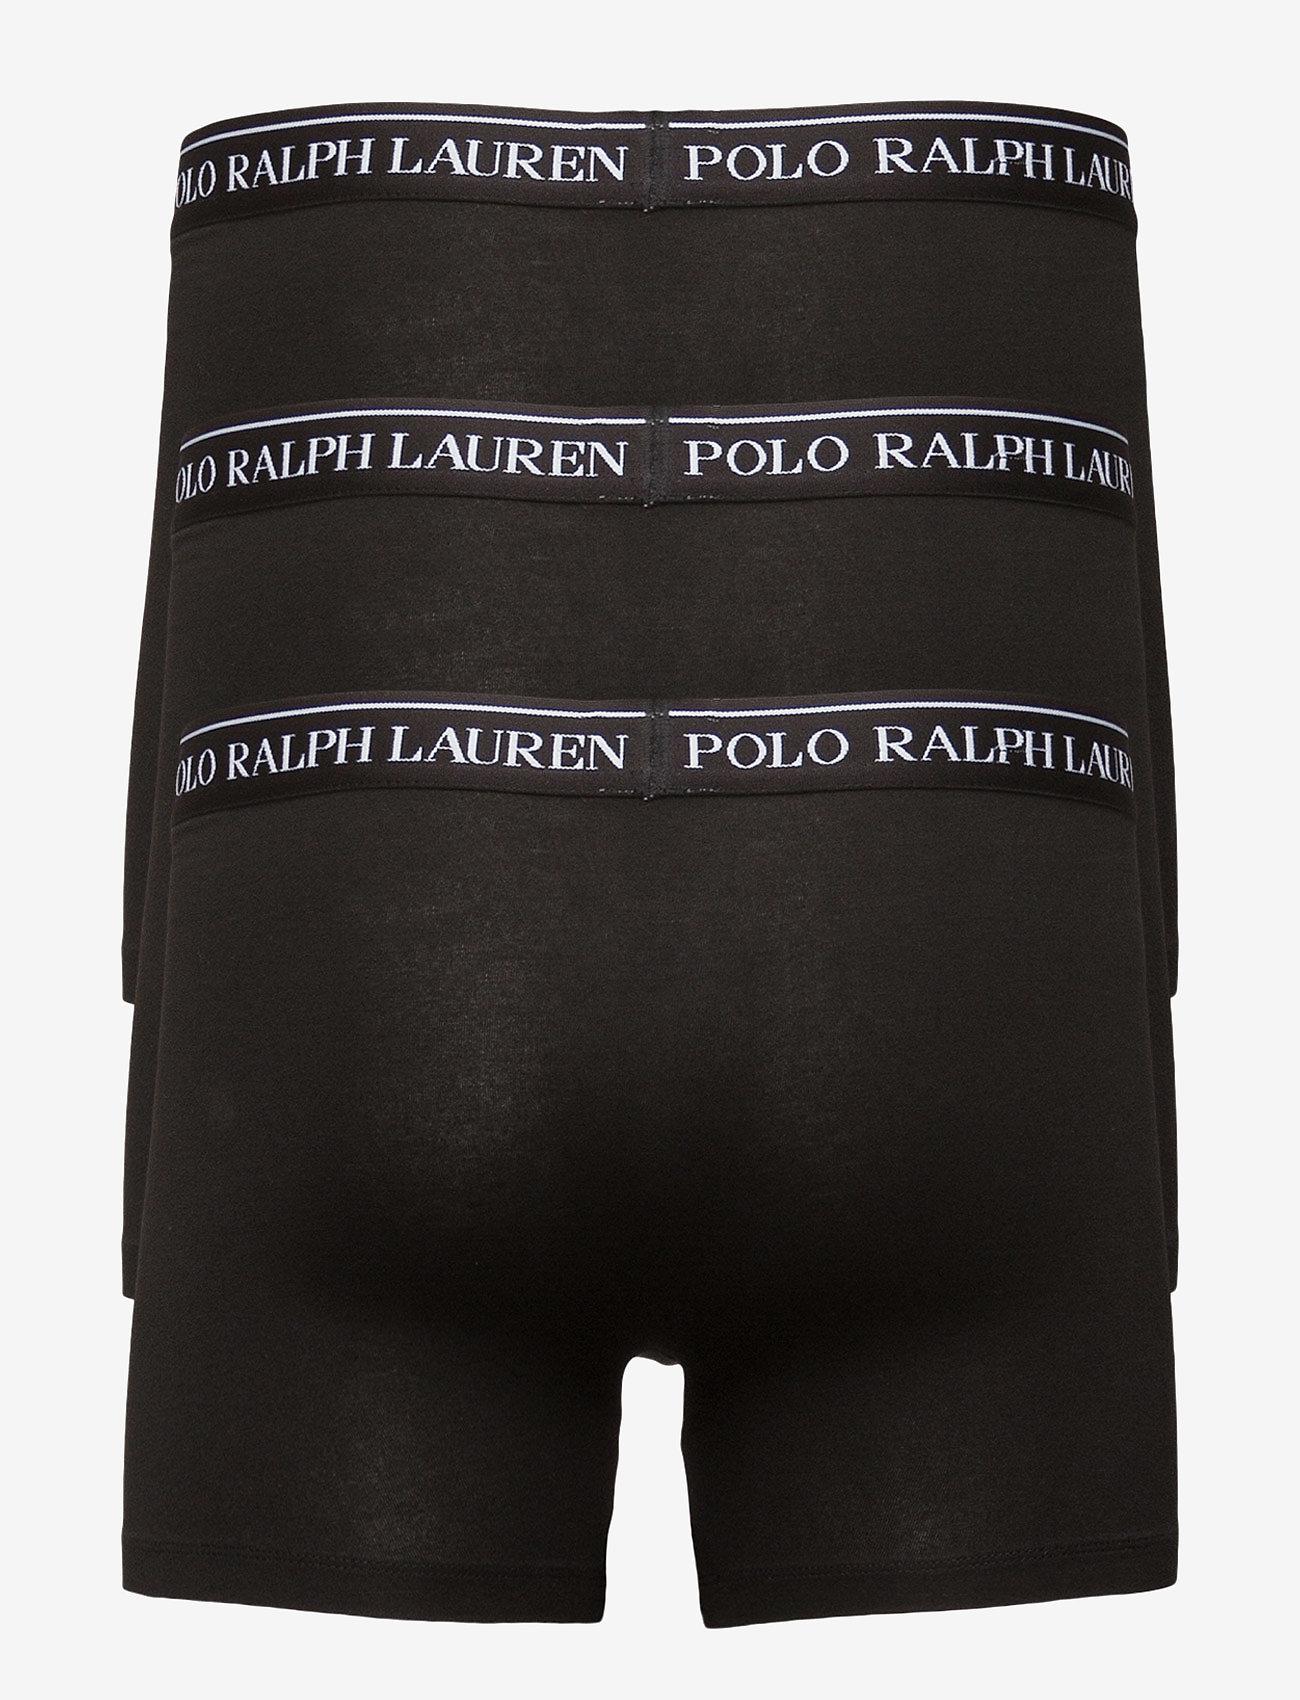 Polo Ralph Lauren Underwear - Stretch-Cotton-Trunk 3-Pack - boxers - 3pk polo blk - 1